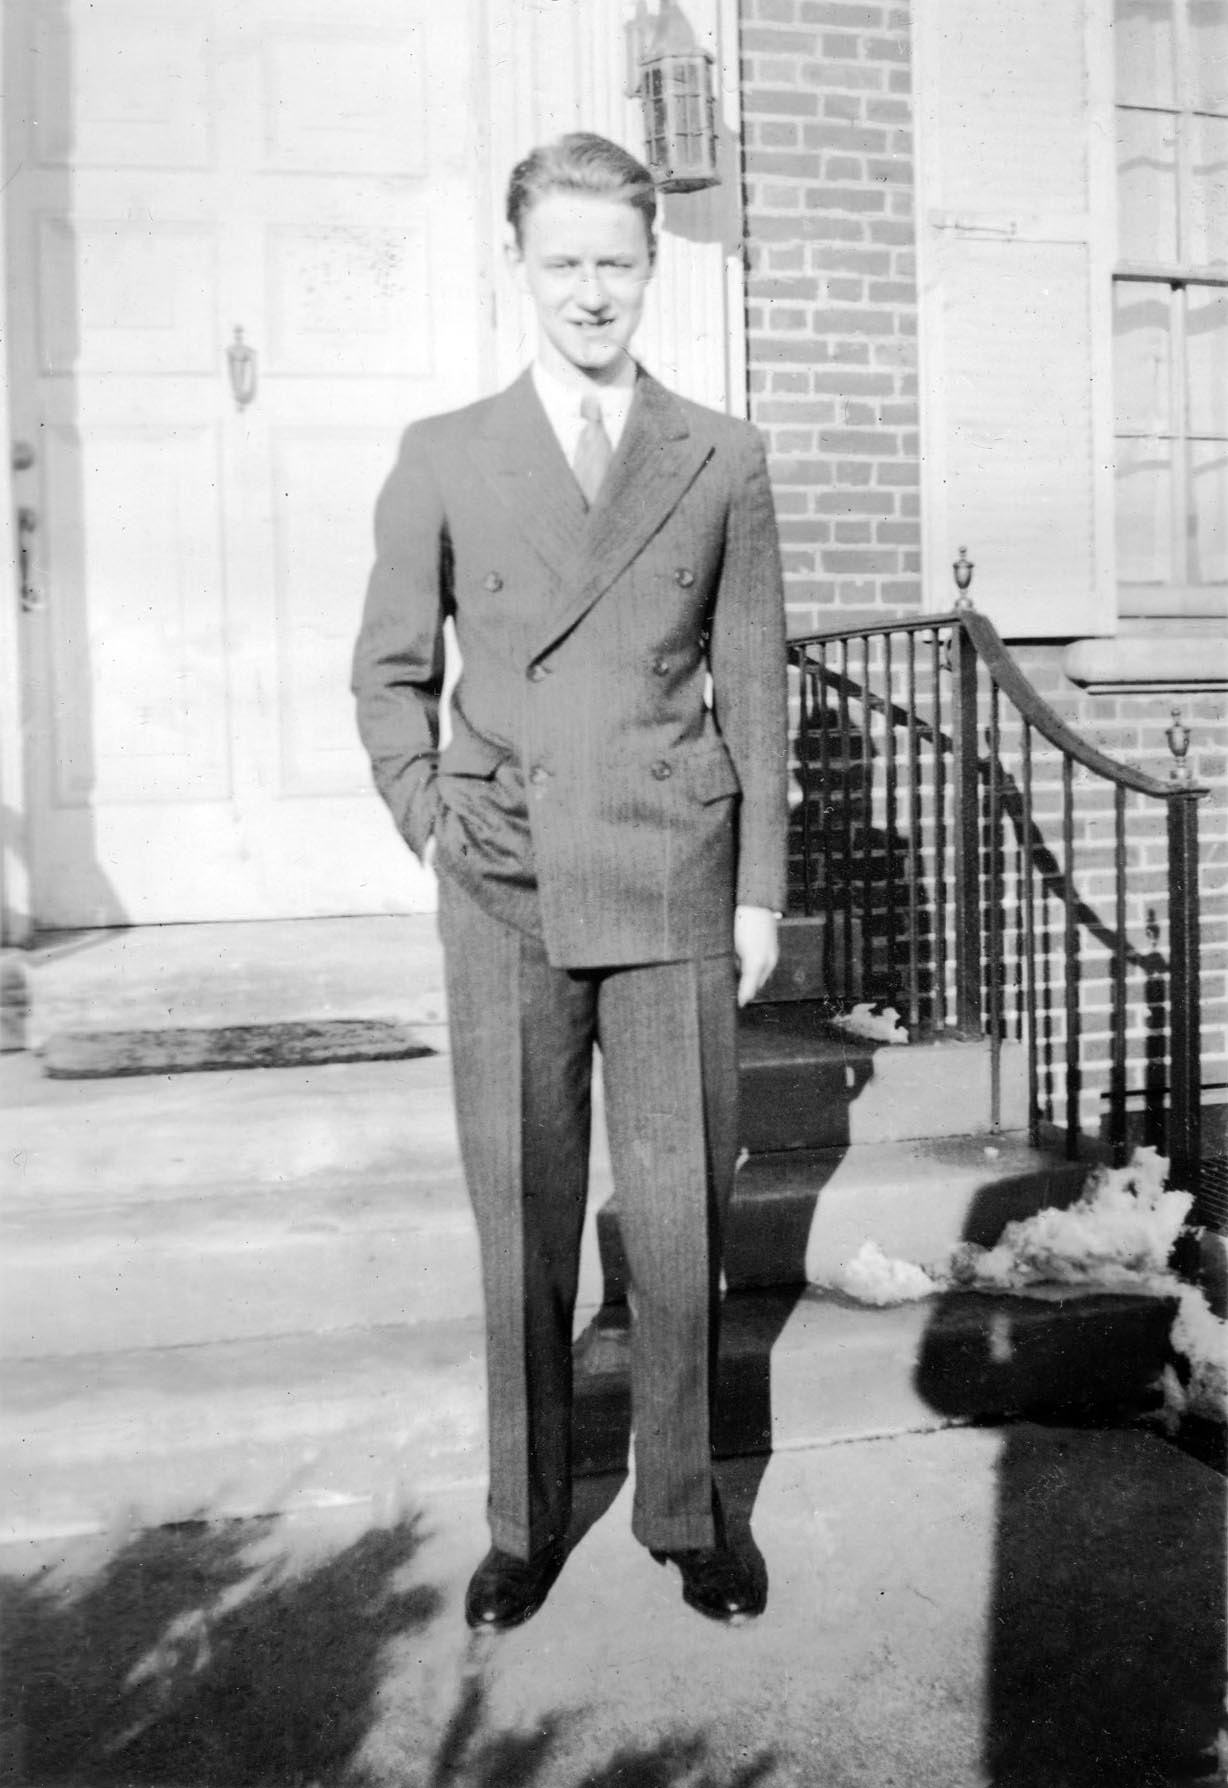 Charles H. Williams Jr. 1940 - Abington, PA